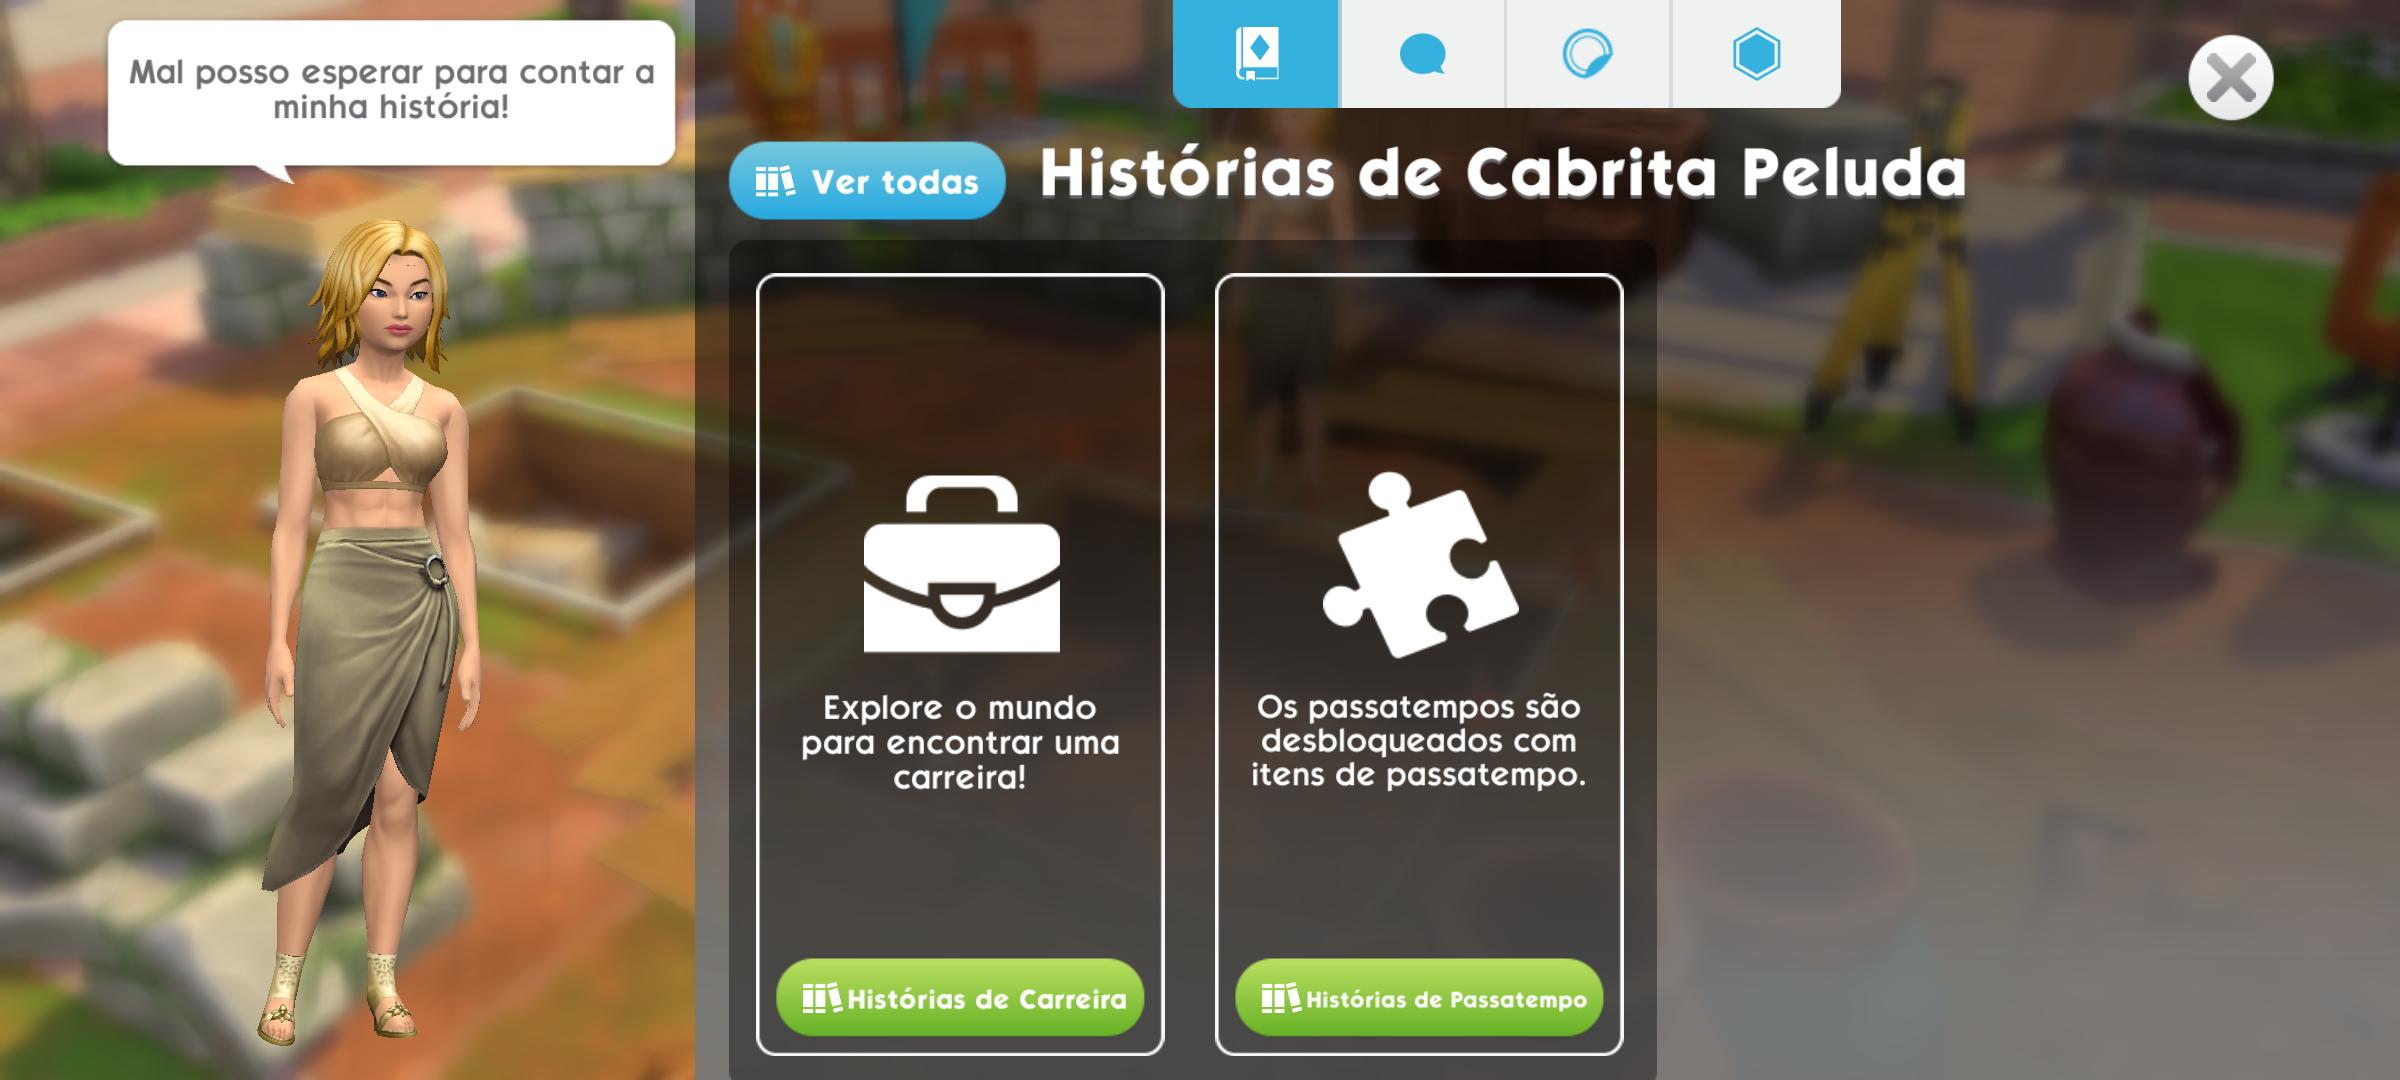 The sims mobile apk mod 2021 infinito